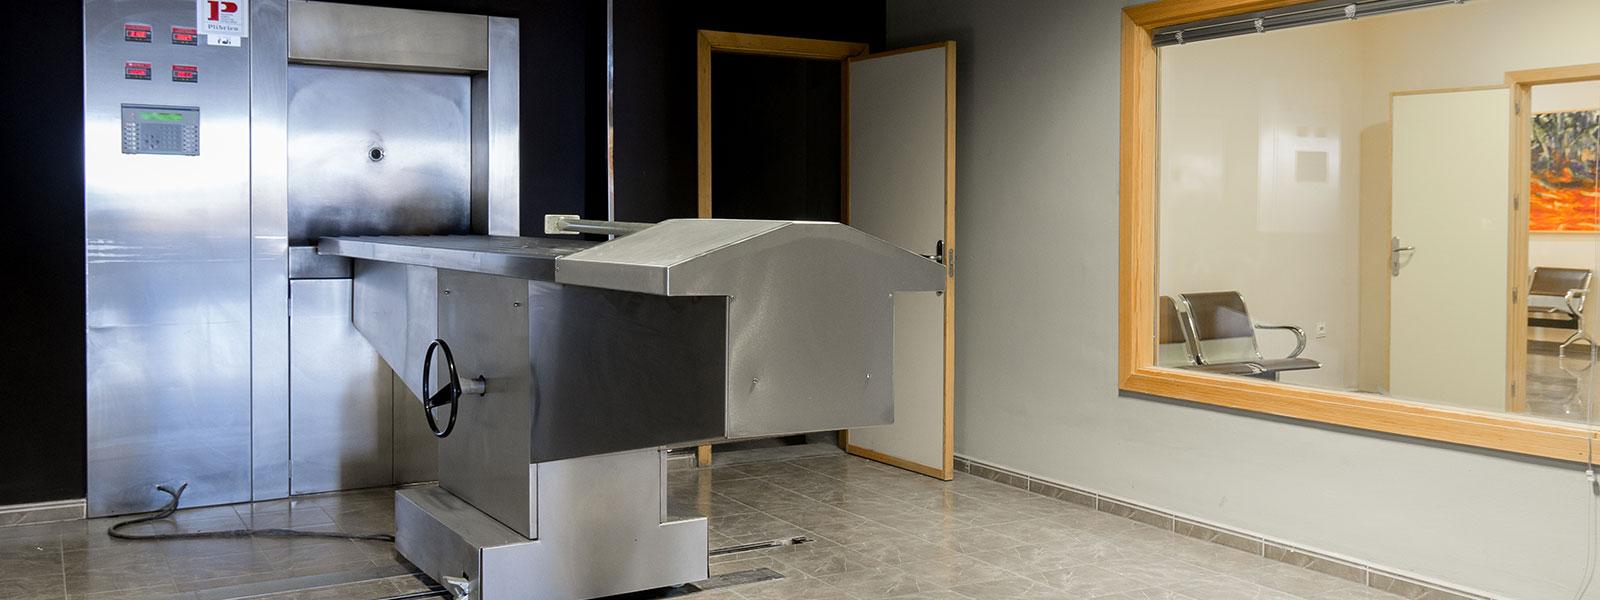 Cremación en Palmavalen | Servicios Funerarios Crematorio